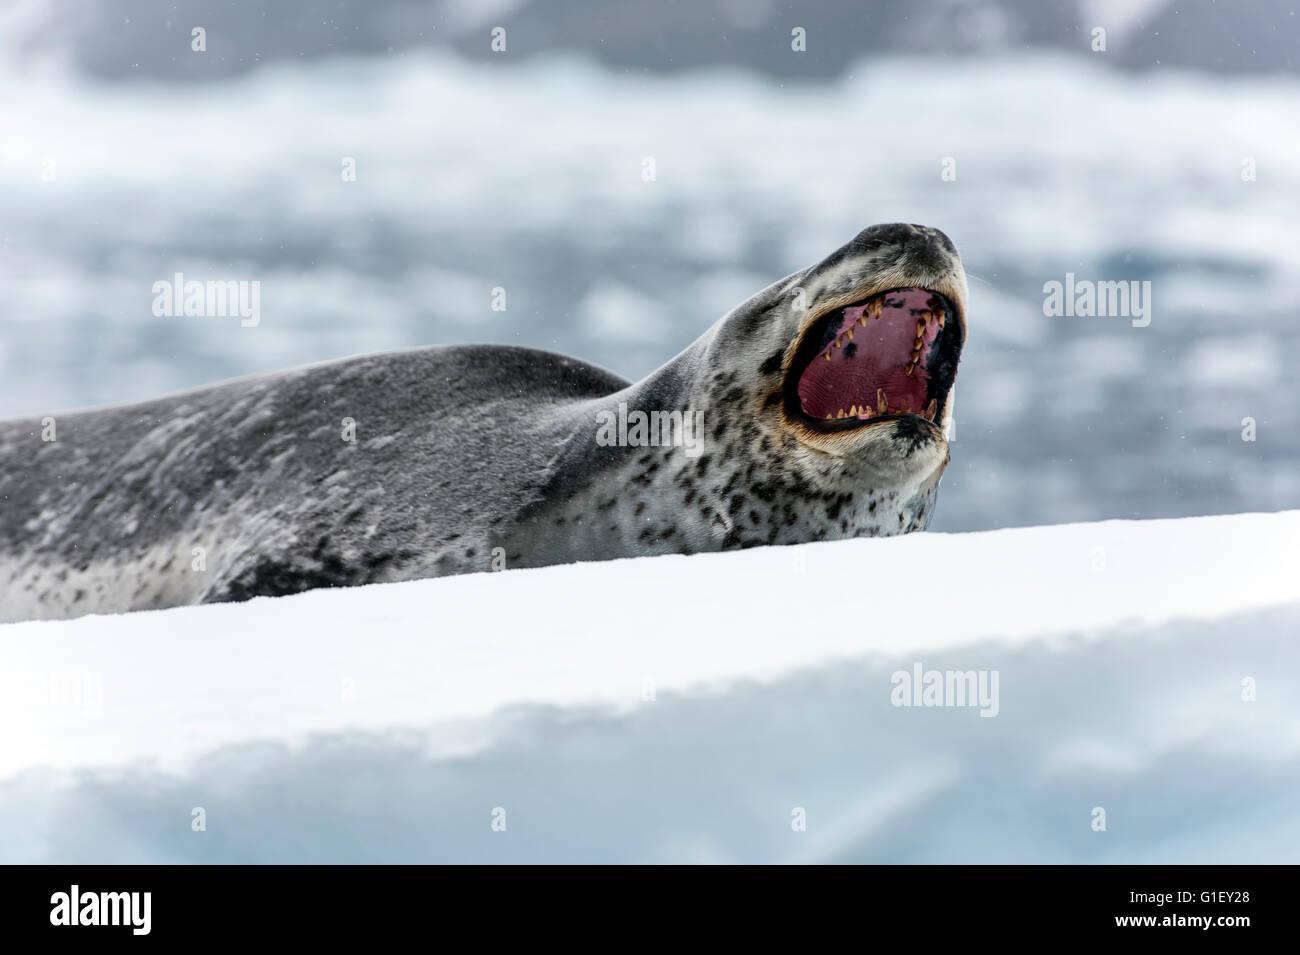 Leopard seal (Hydrurga leptonyx) or sea leopard yawning on ice Cierva Cove Antarctic Peninsula Antarctica - Stock Image